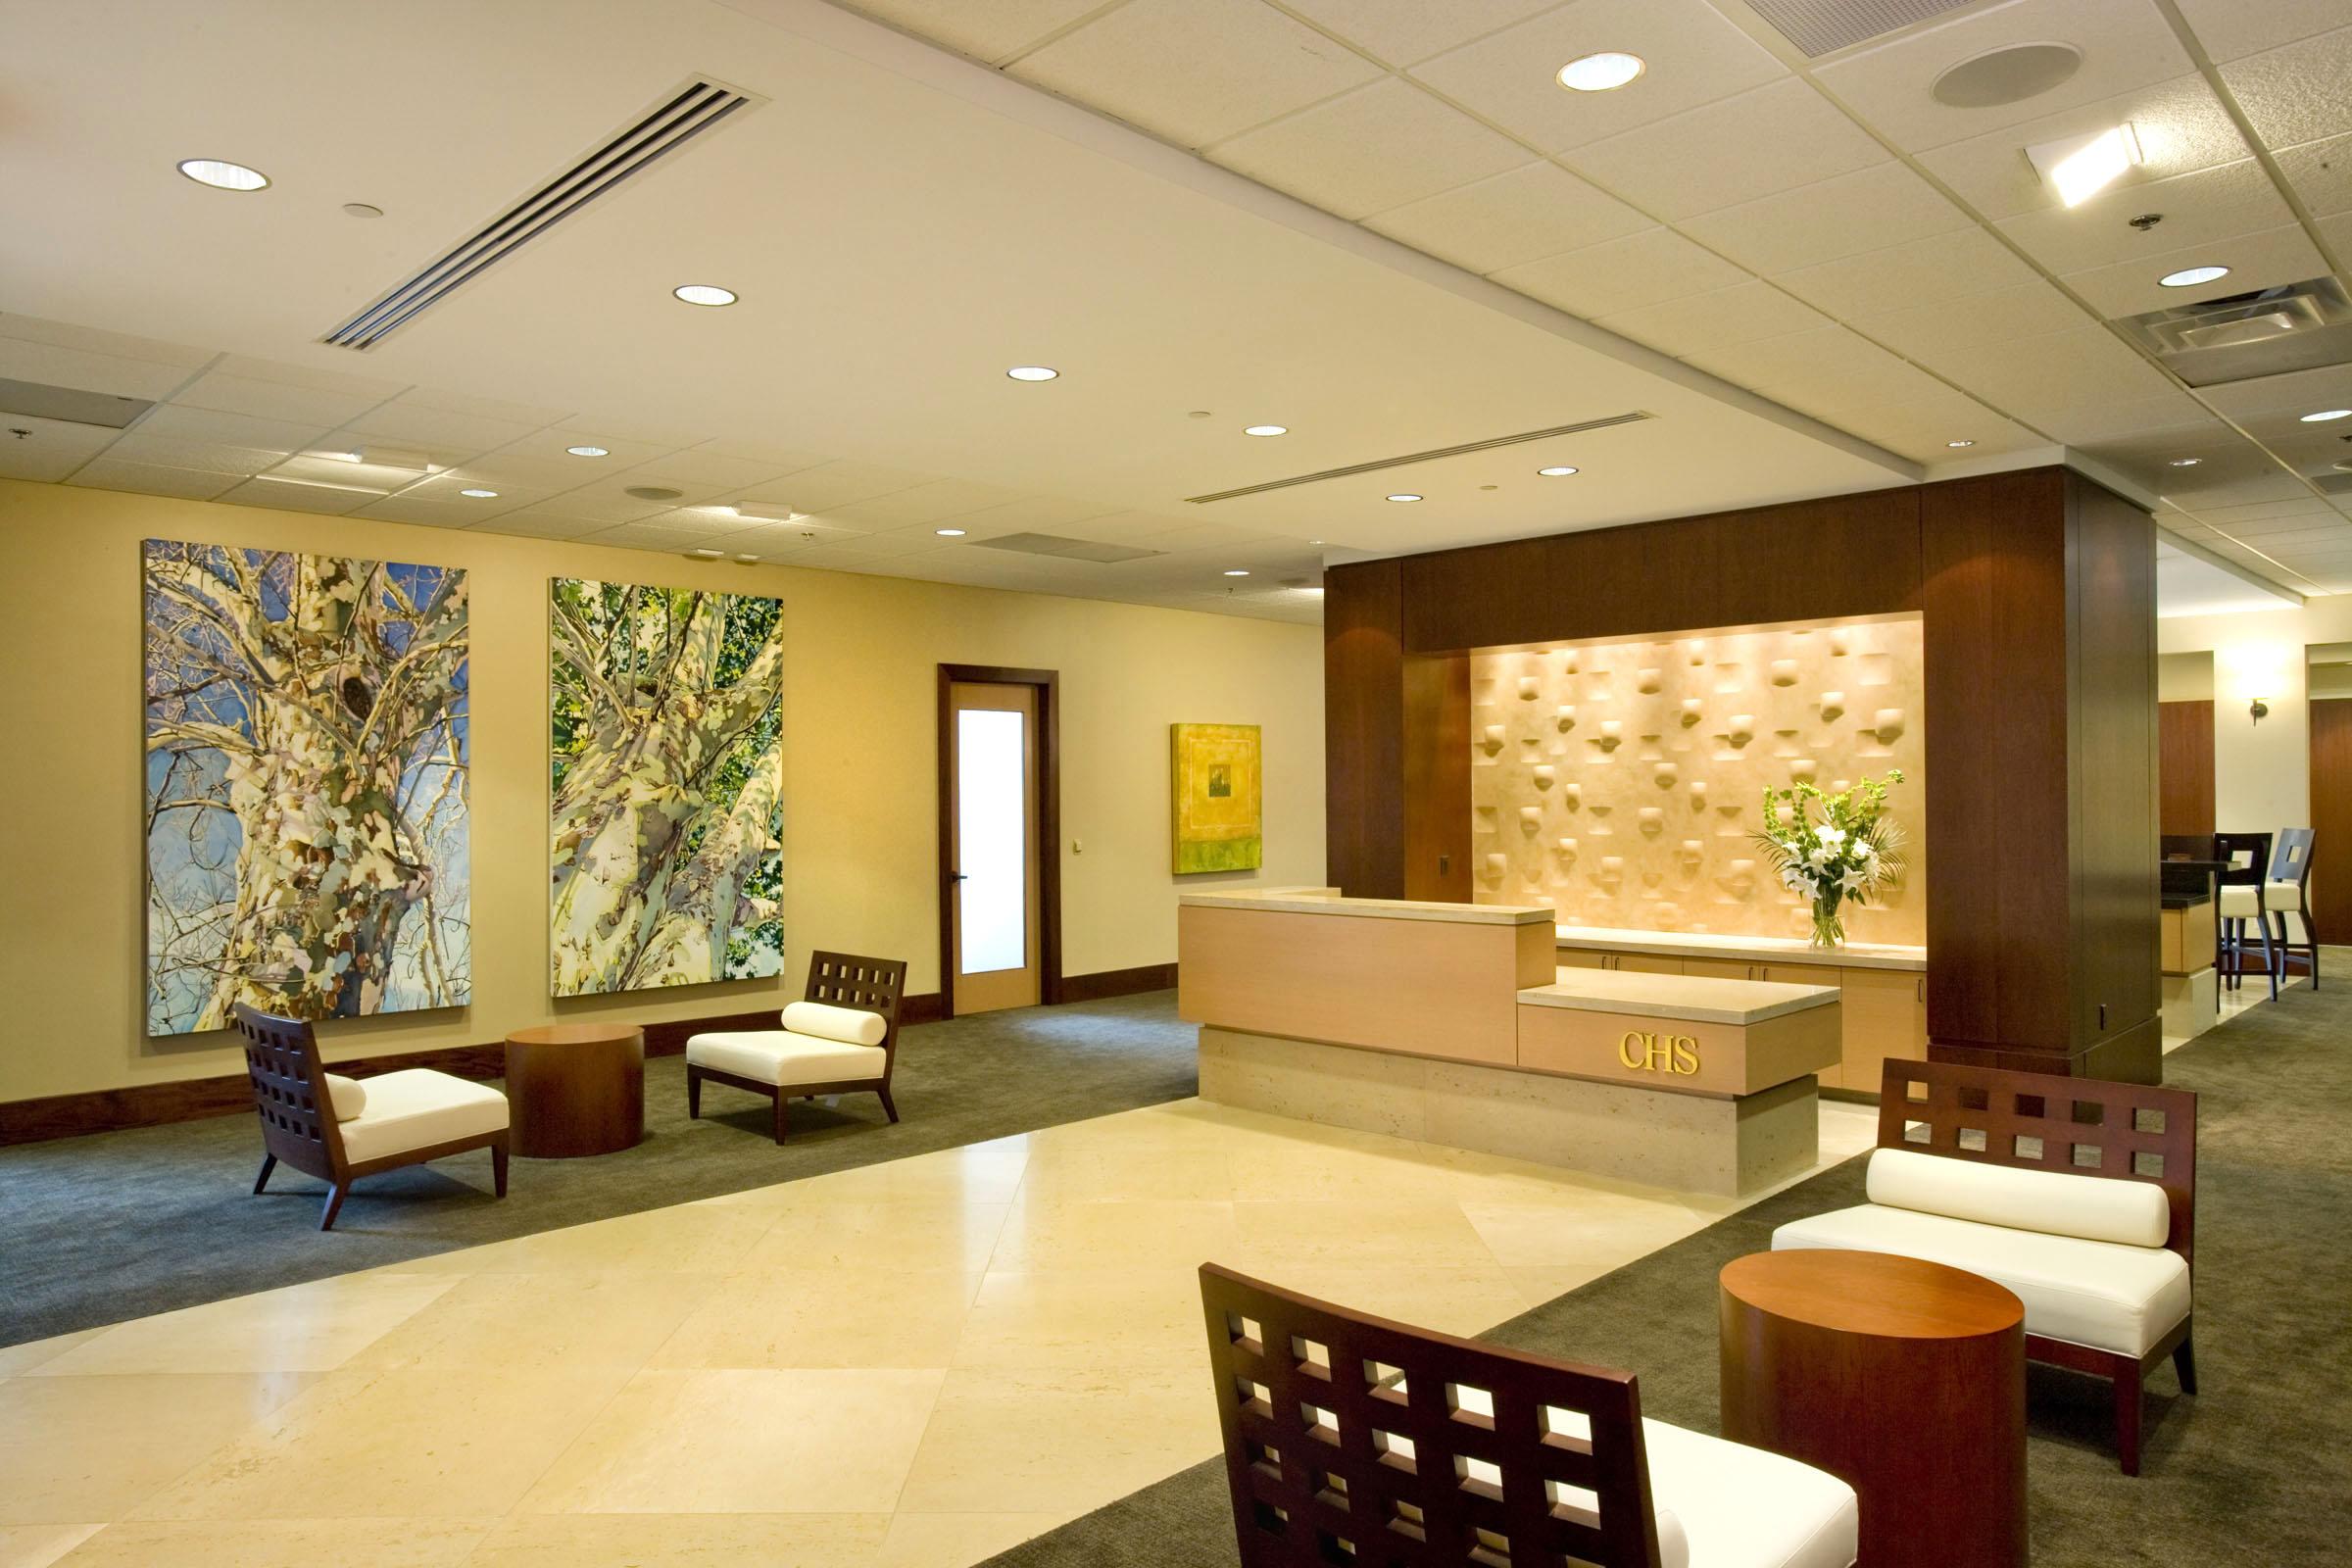 CHS Corporate Office